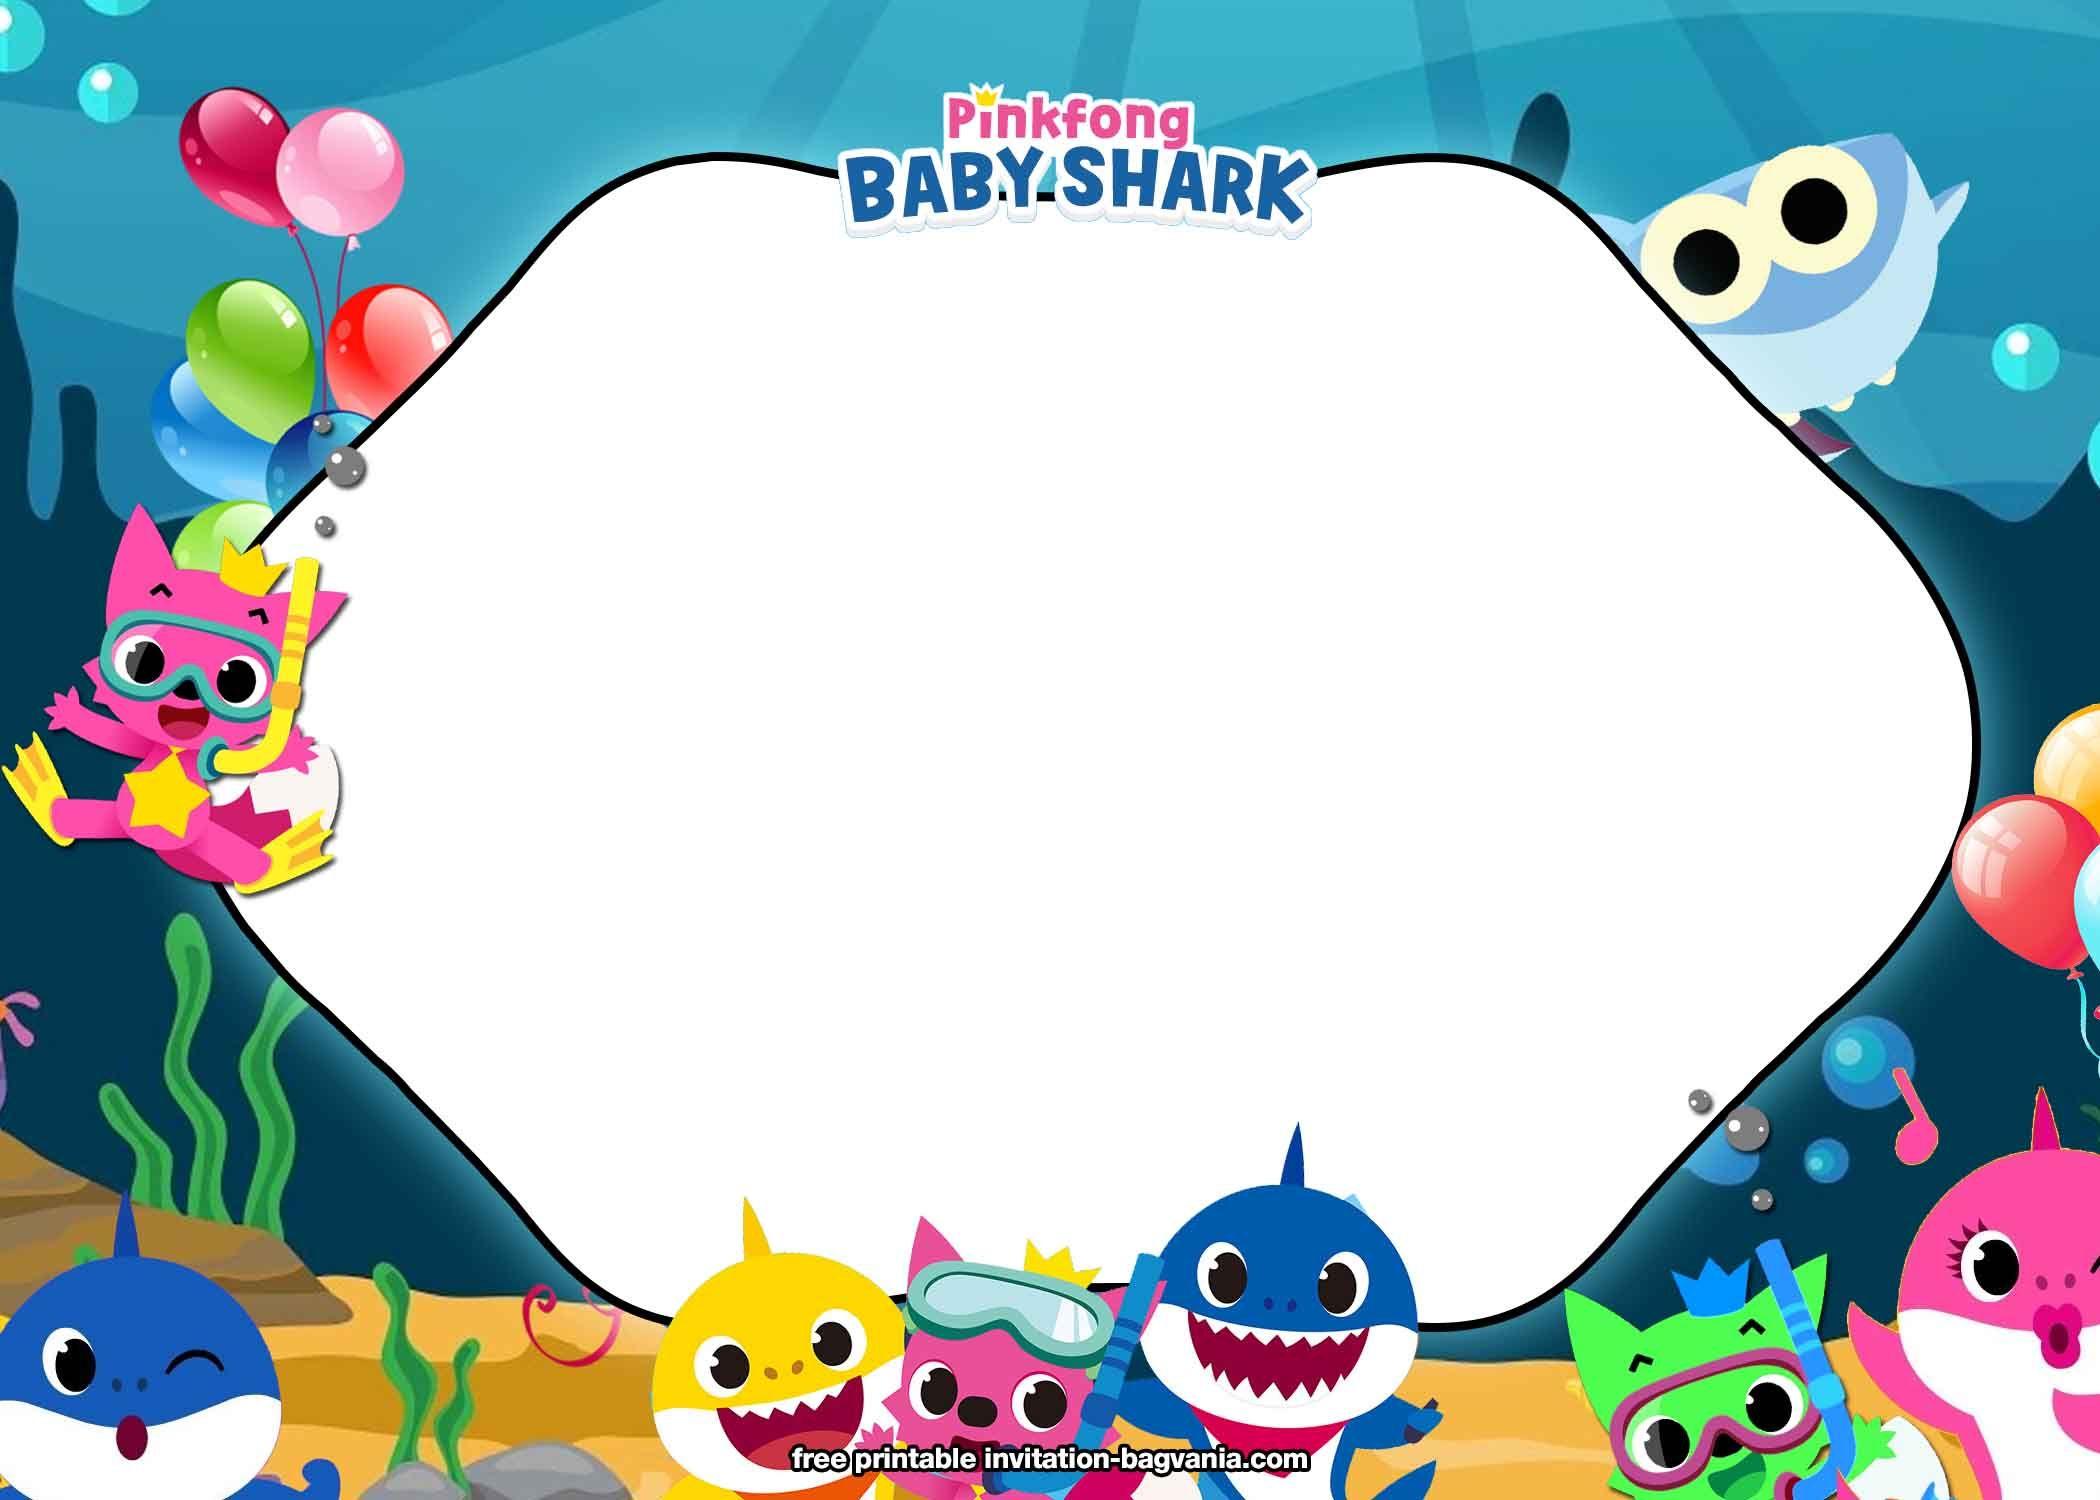 Free Printable Baby Shark Birthday Invitation Templates Shark Birthday Invitations Shark Birthday Party Invitation Shark Theme Birthday